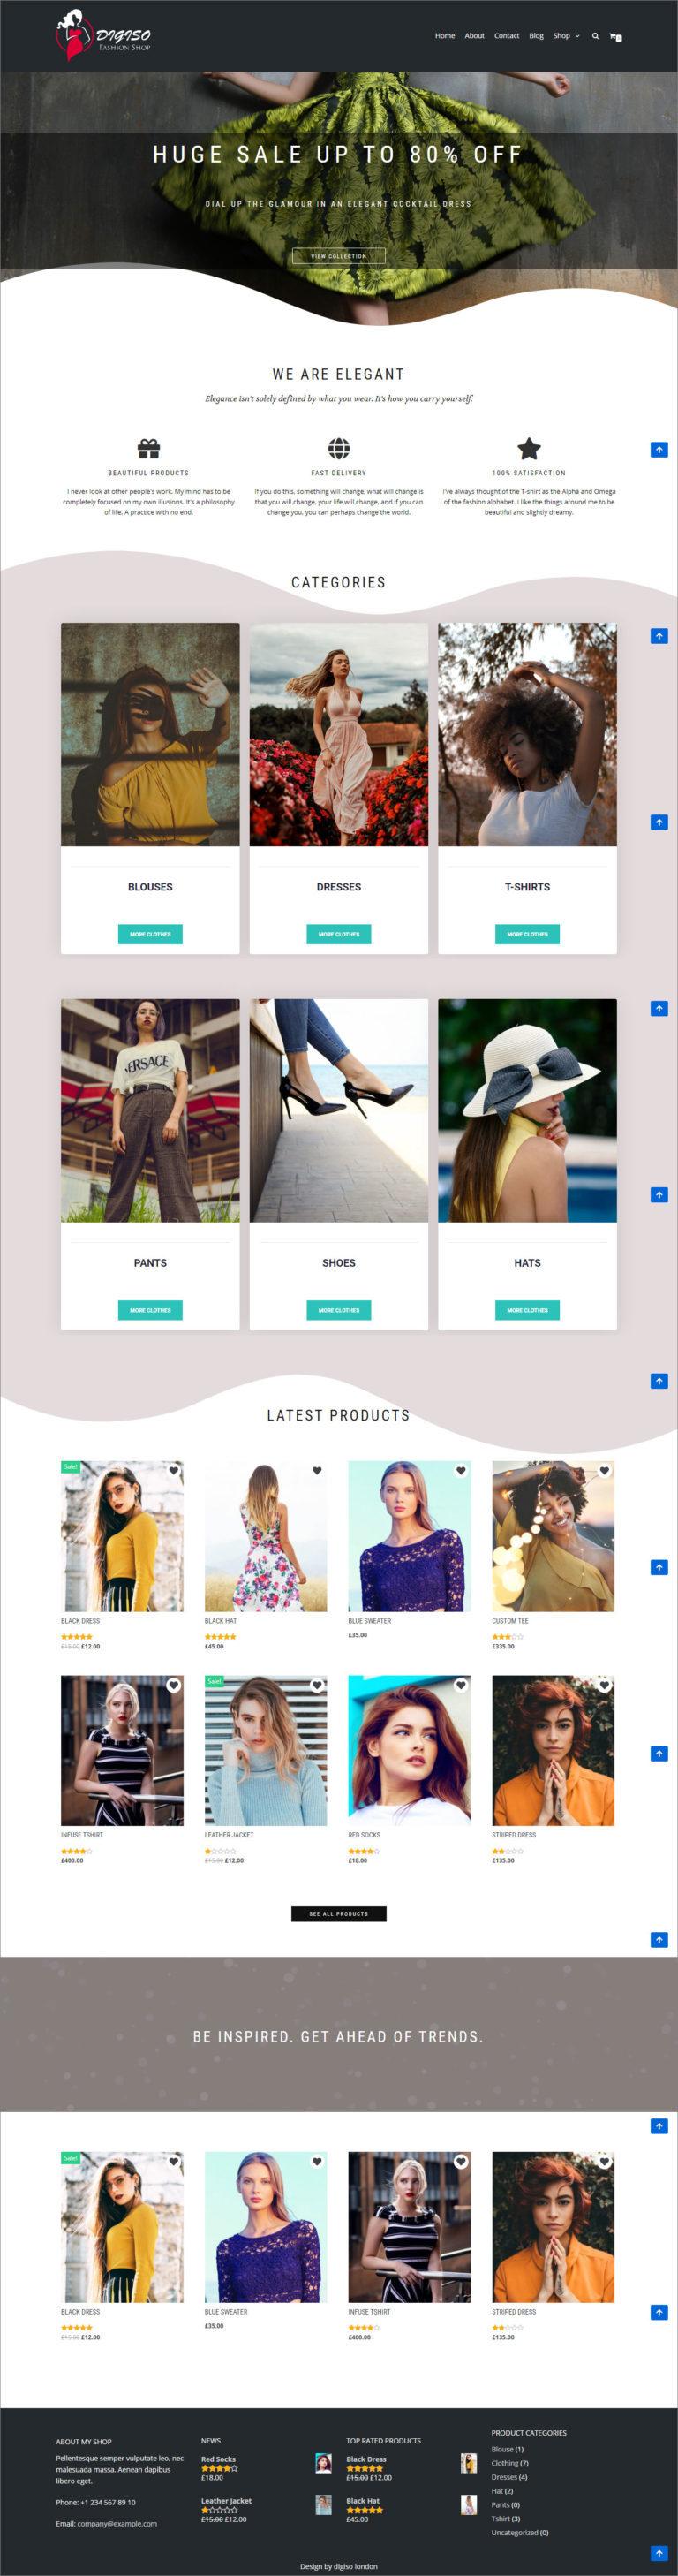 Ecommerce Website For Fashion Shop